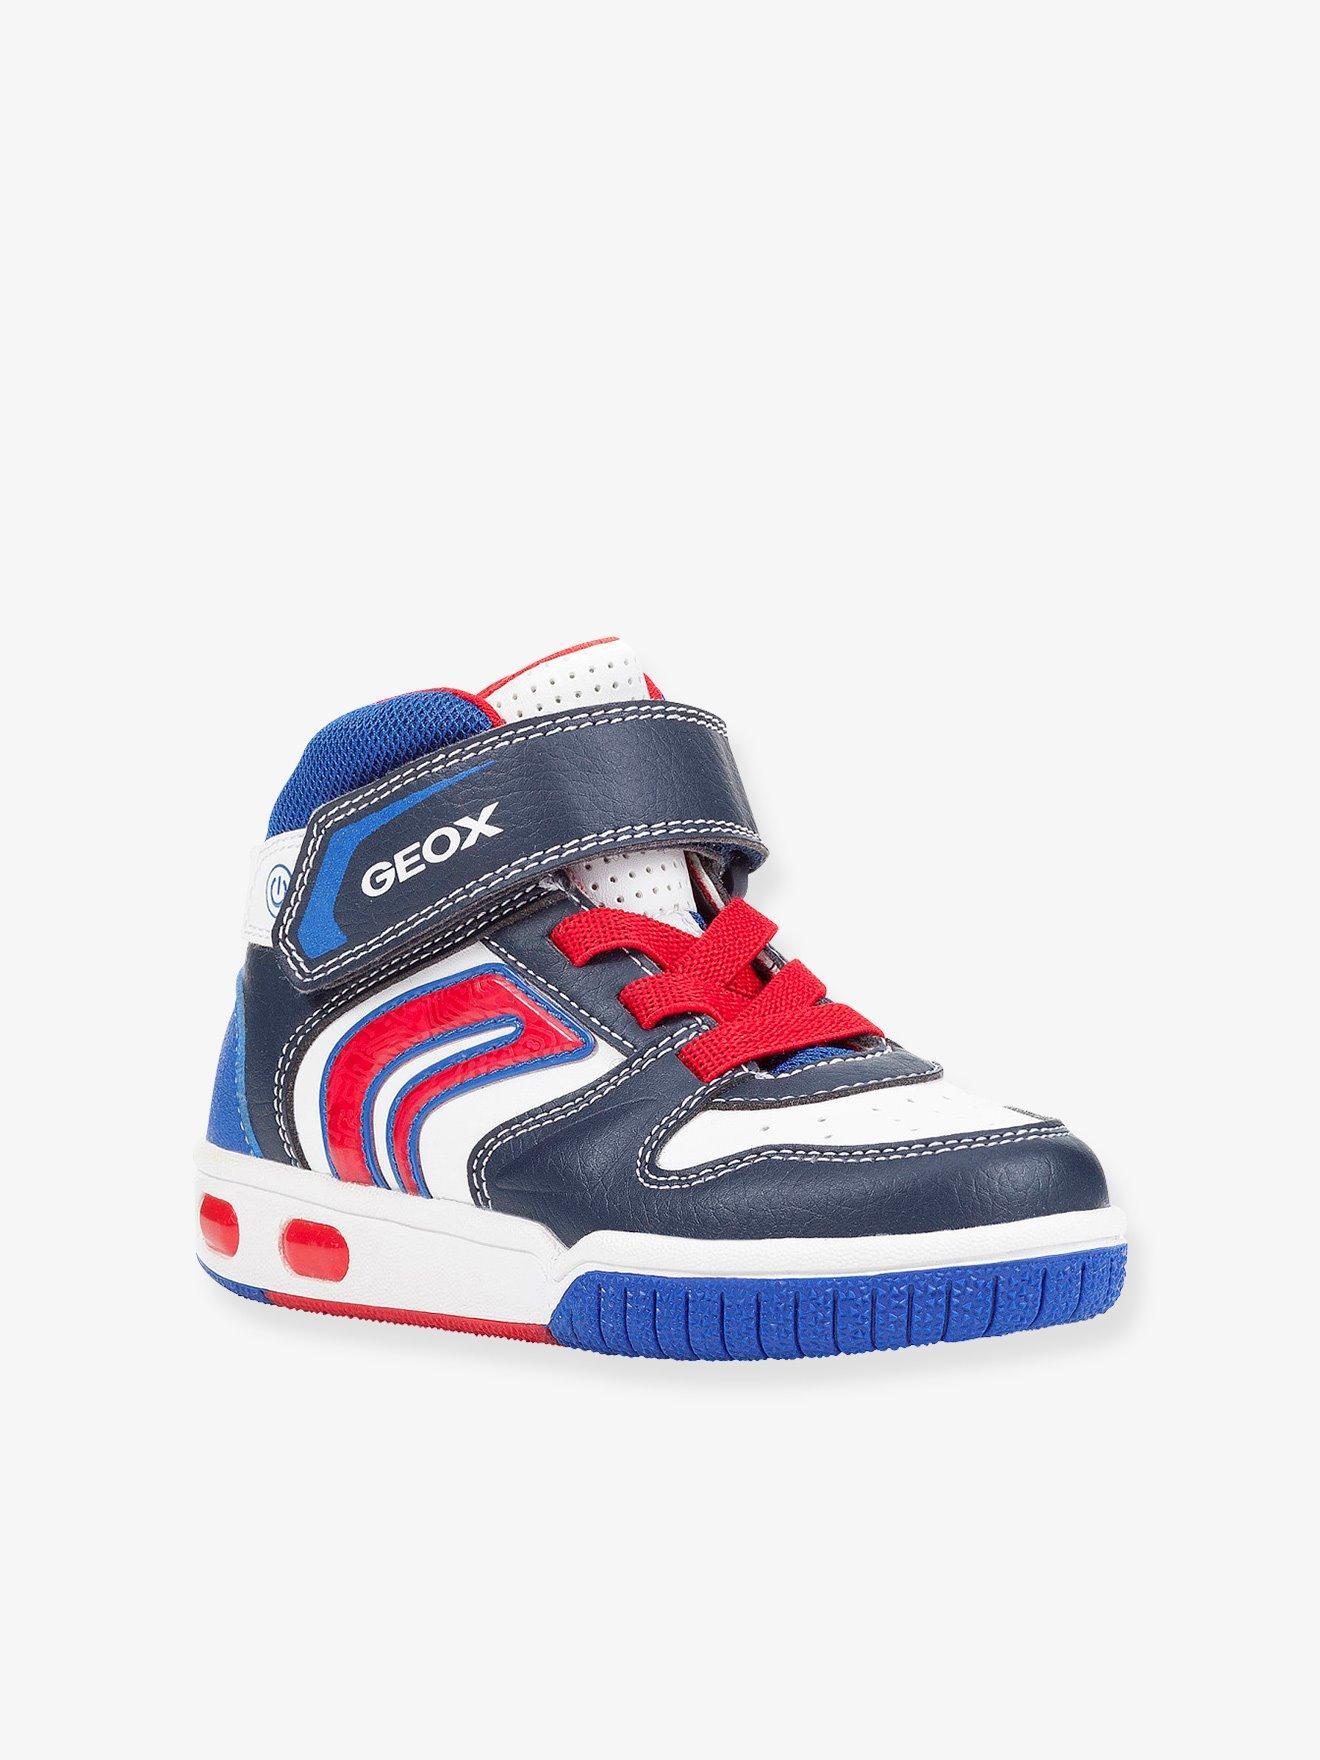 1bb57fd1 Zapatillas de caña alta para niño gregg boy high geox® azul medio  bicolor/multicolor